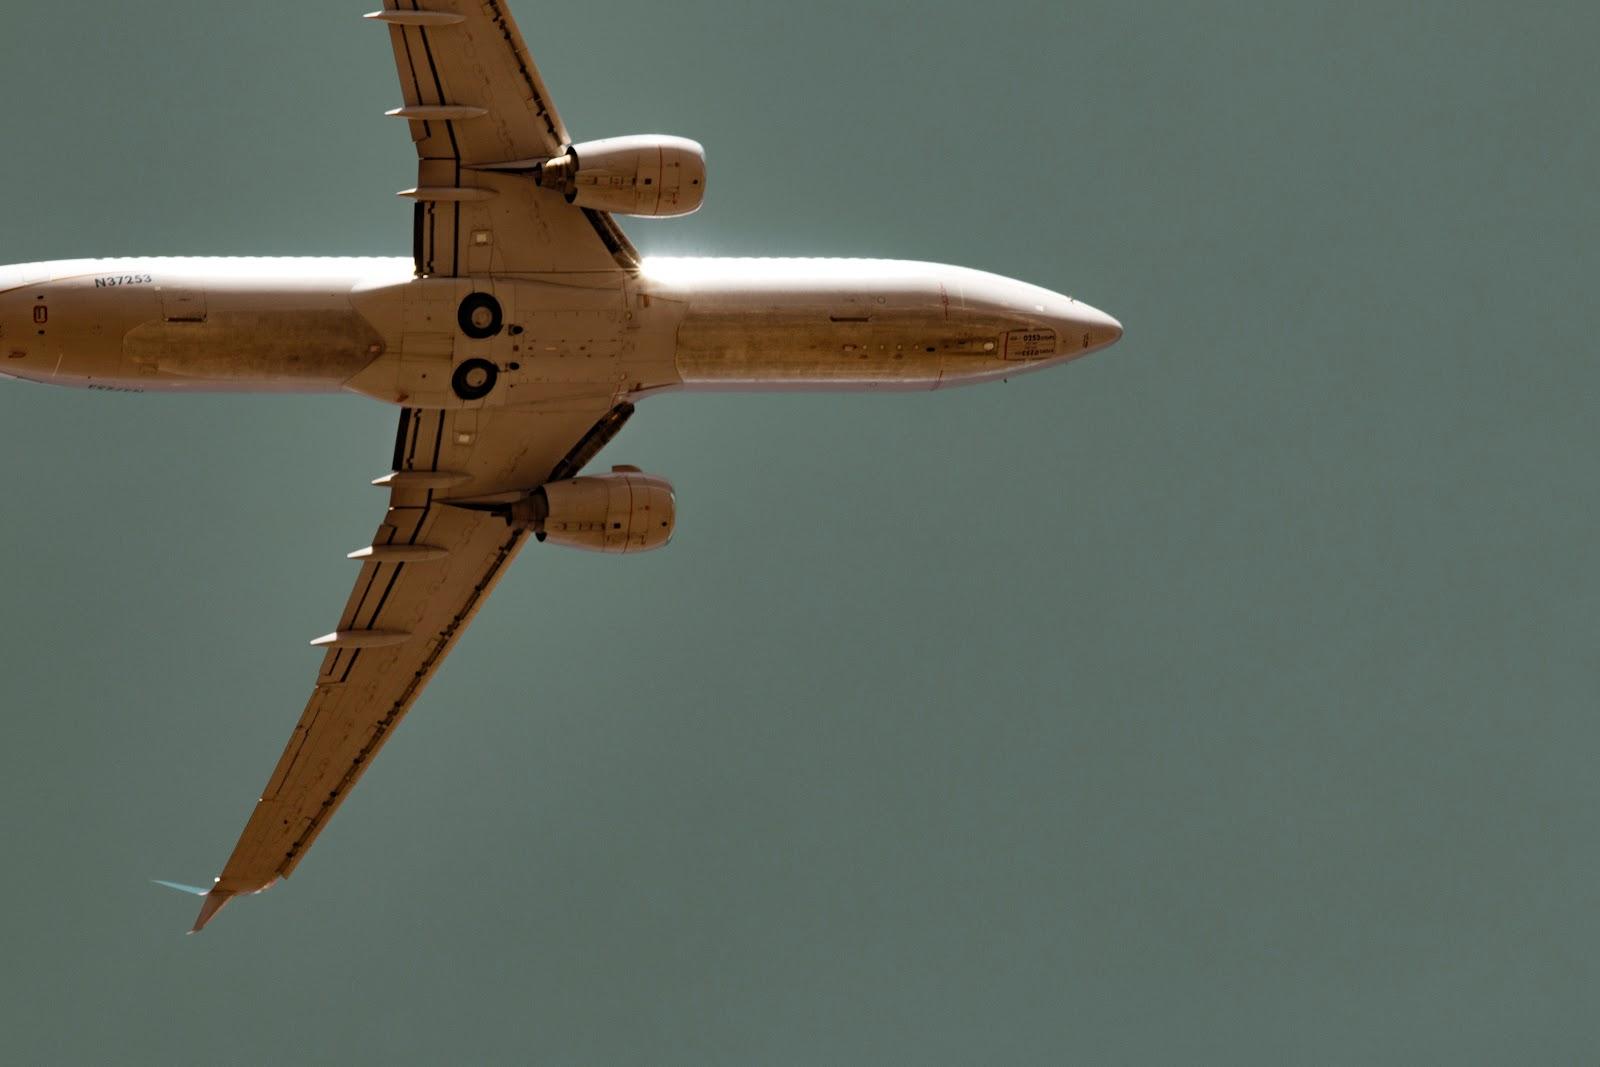 plane-img-1.jpg